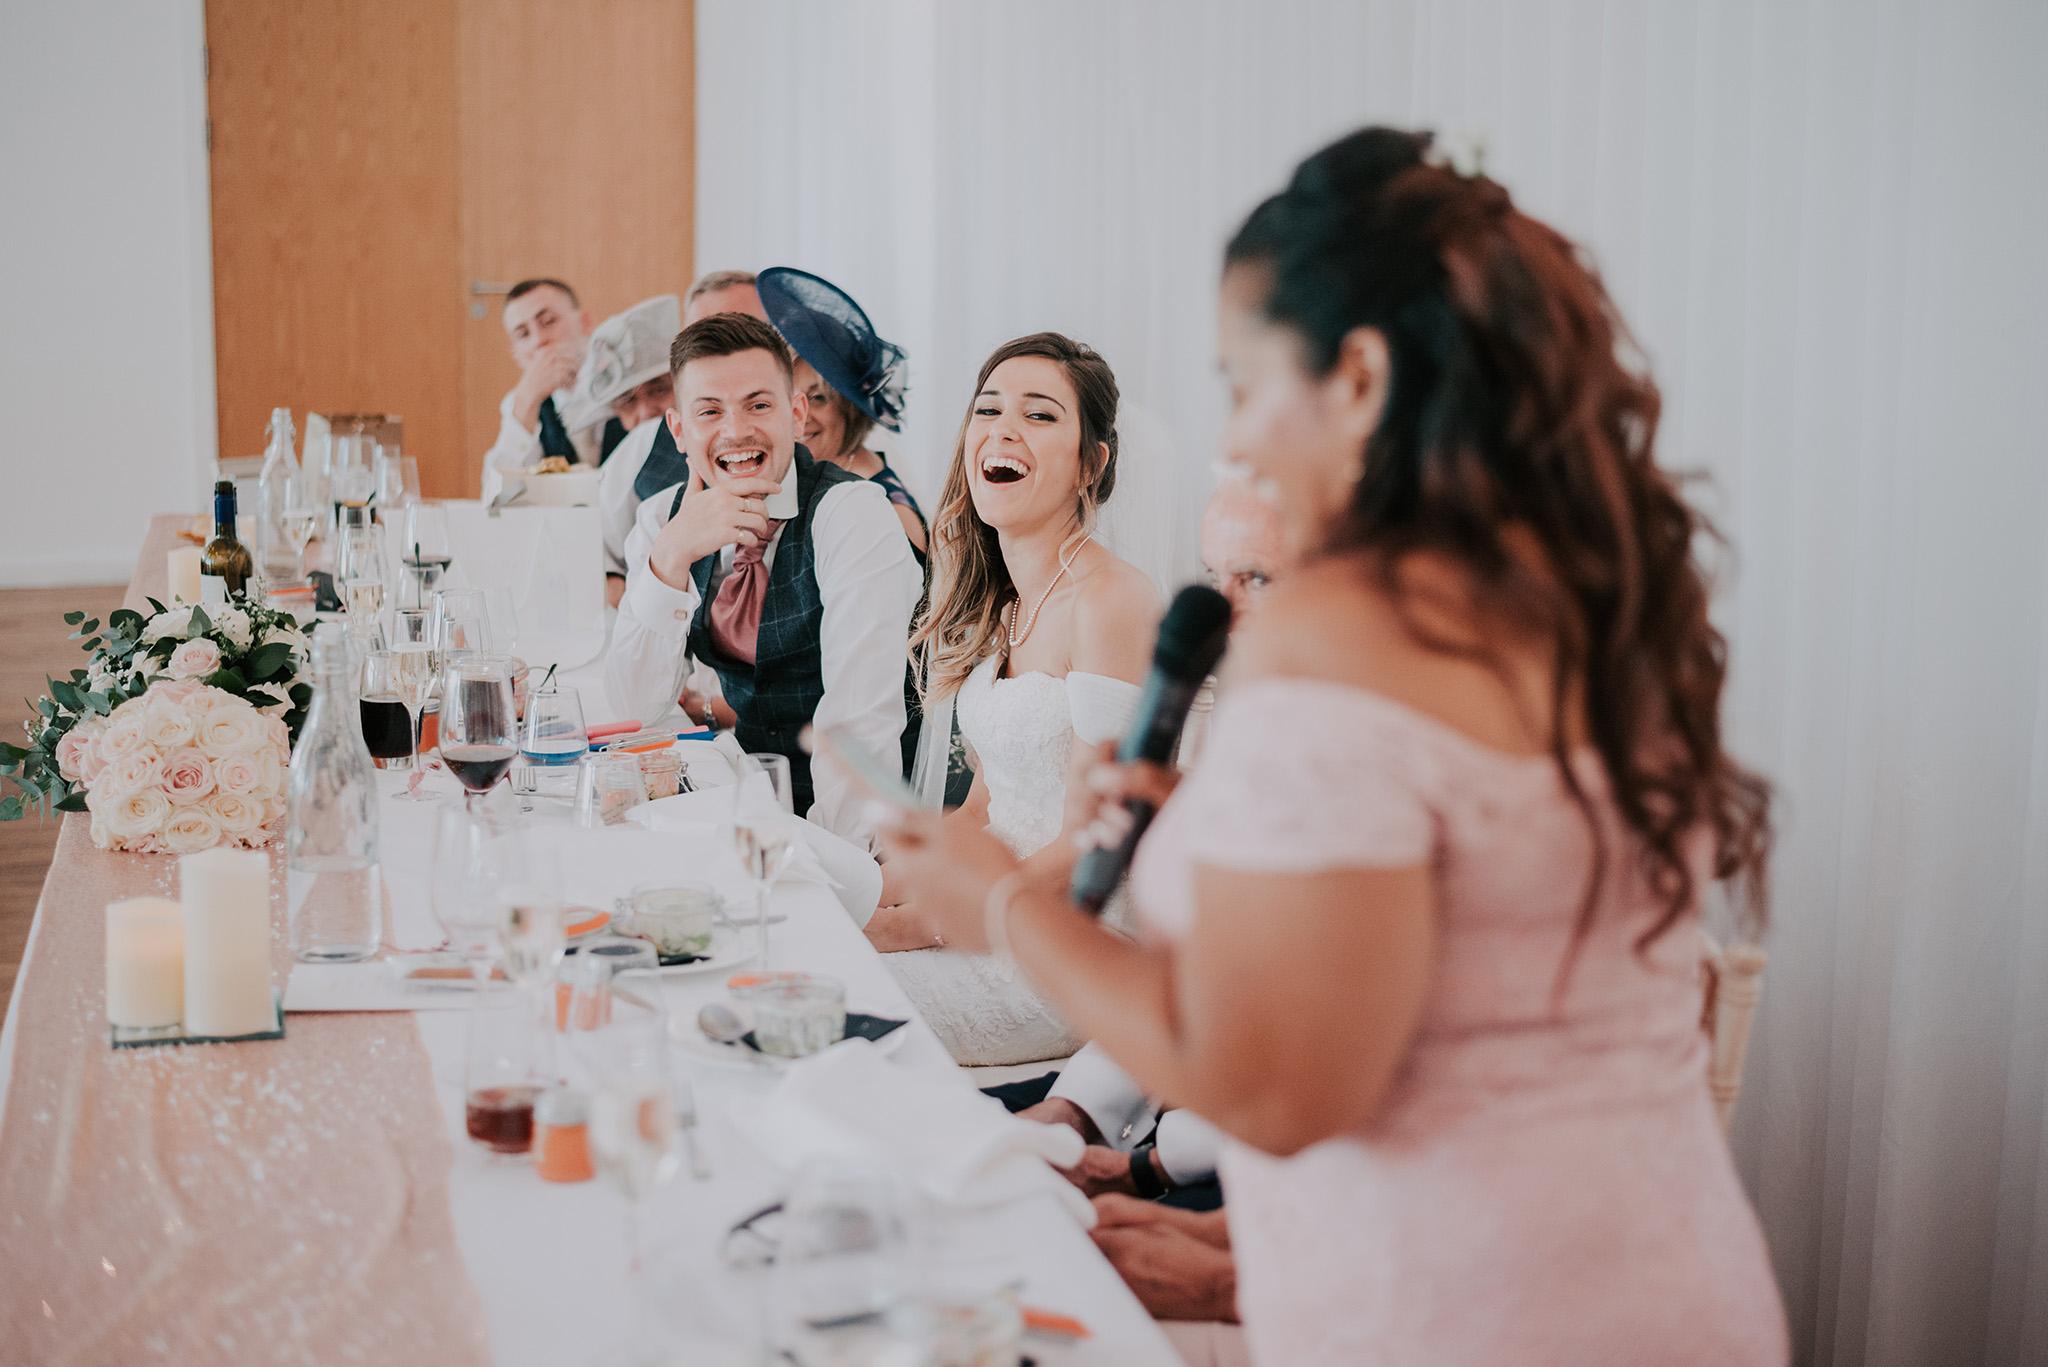 scott-stockwell-photography-wedding-12.jpg